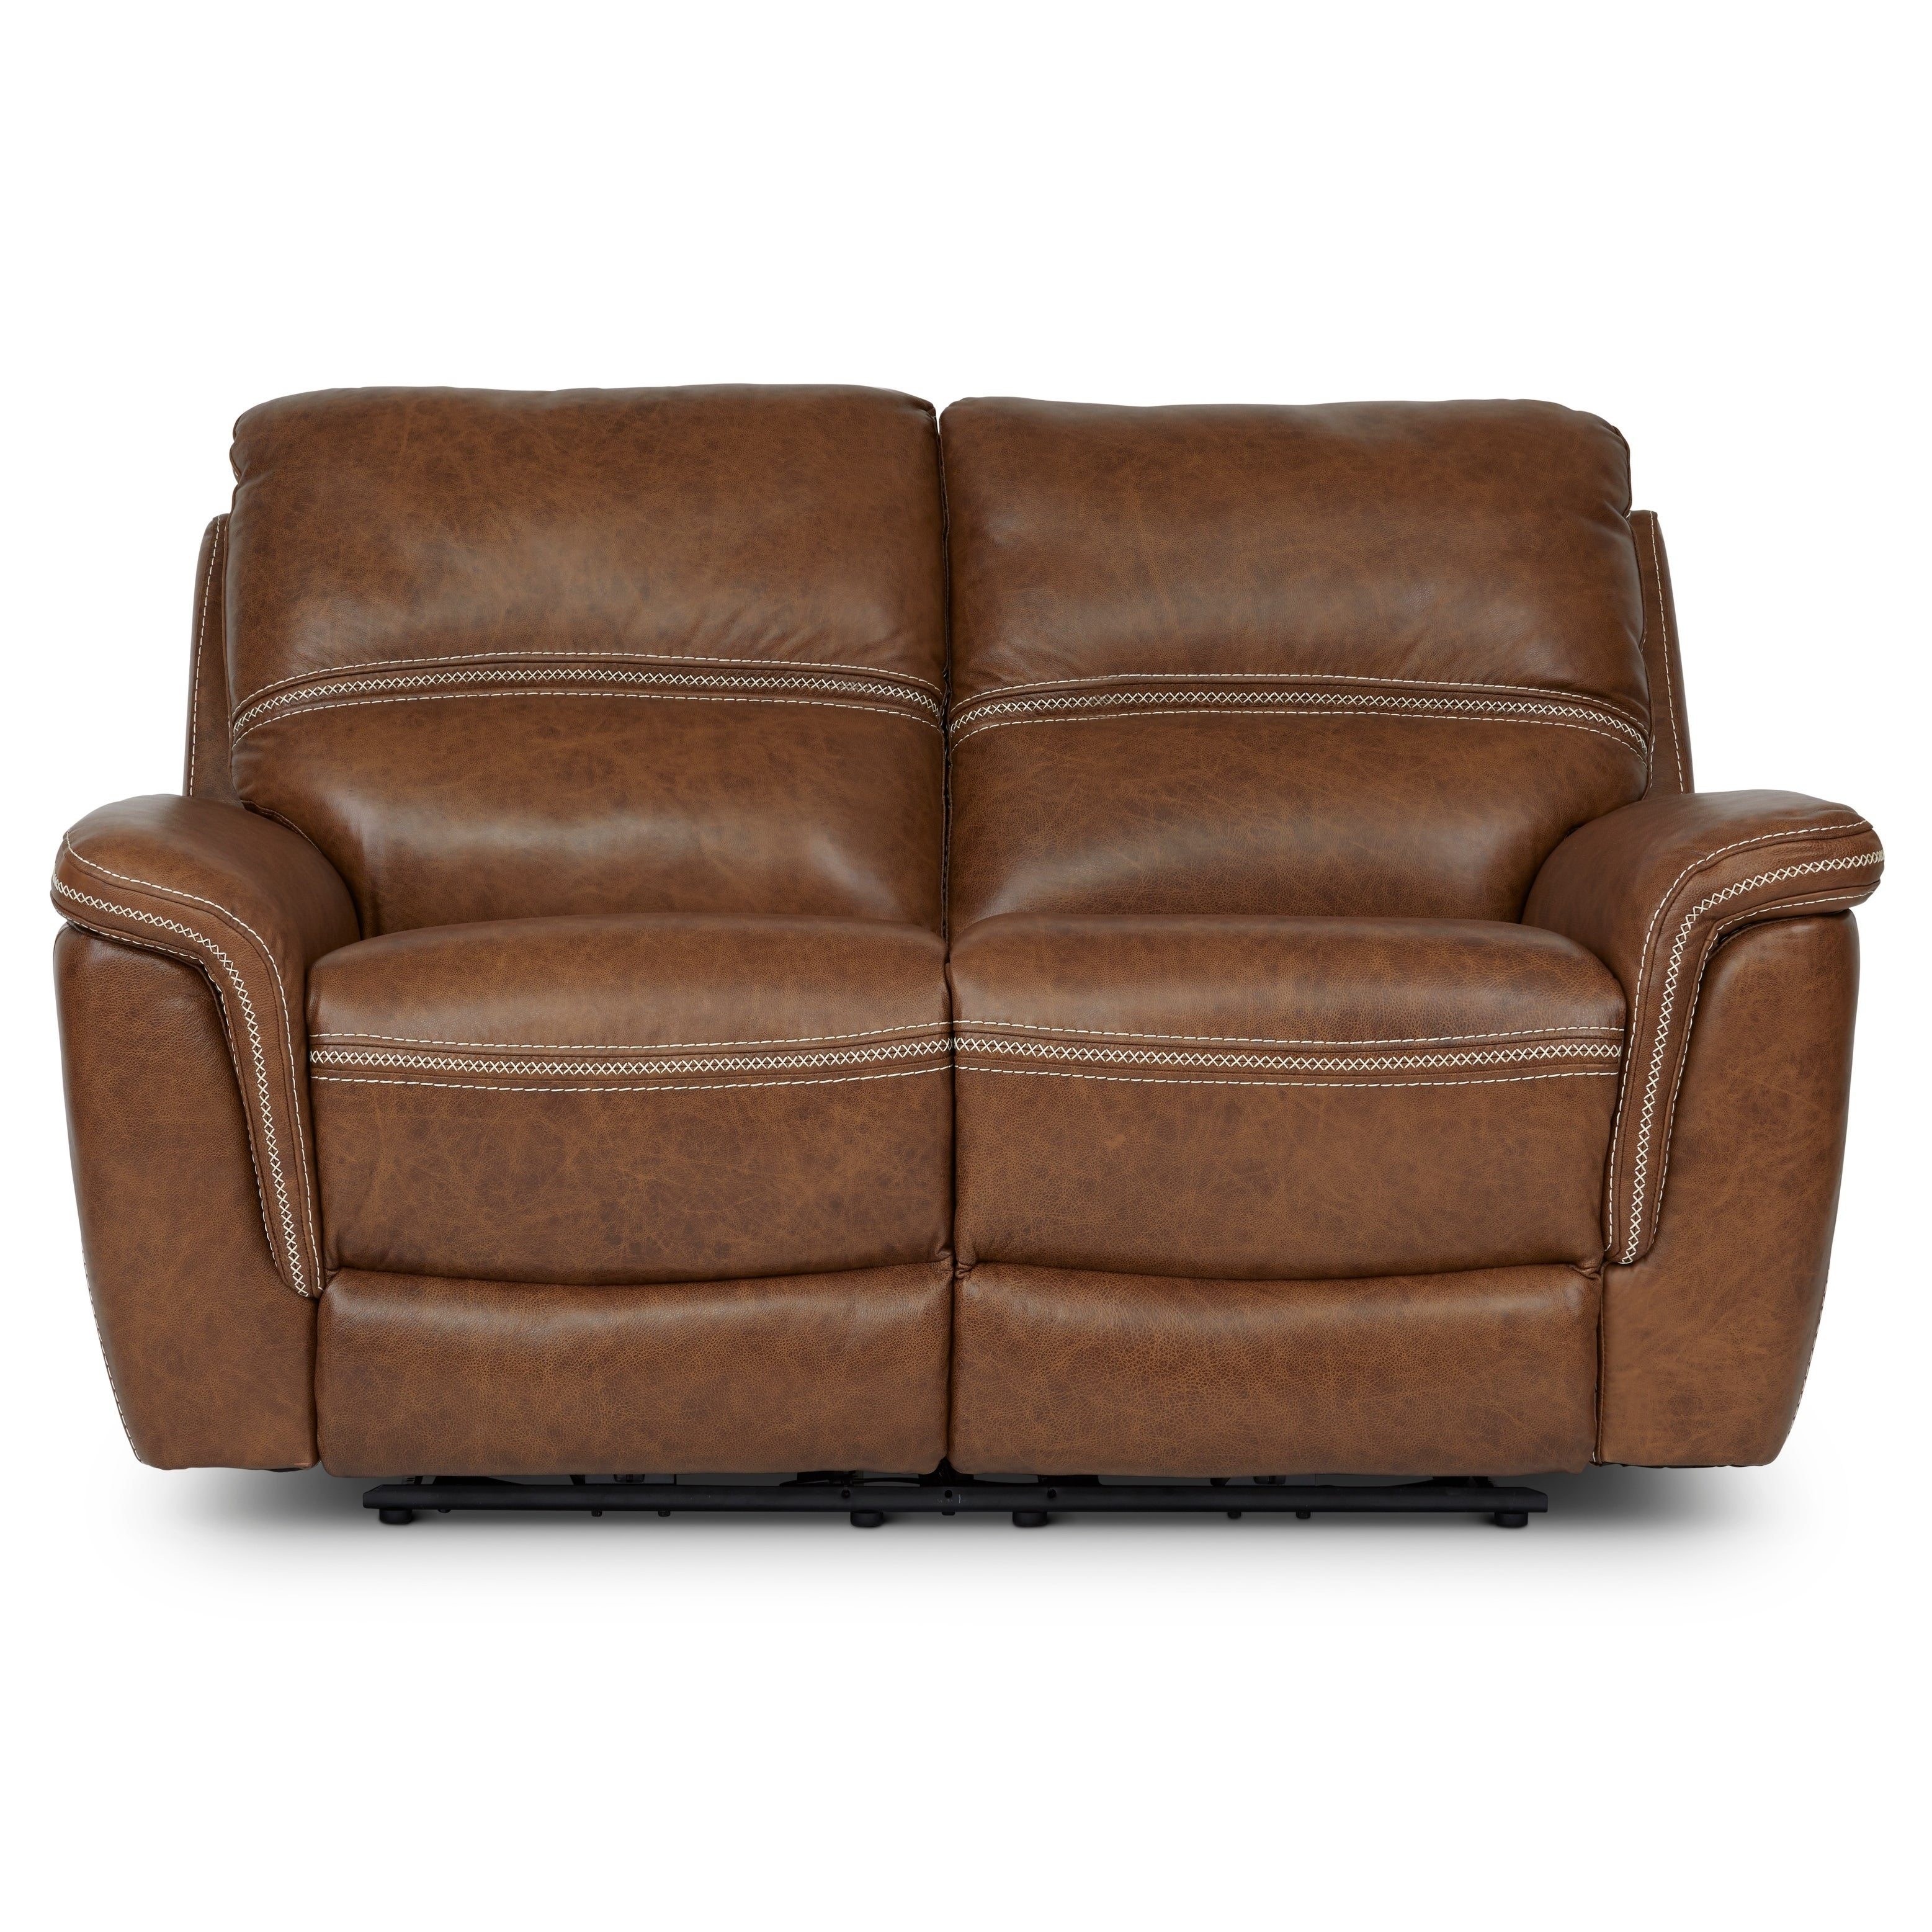 68 Inch Leather Sofa Baci Living Room